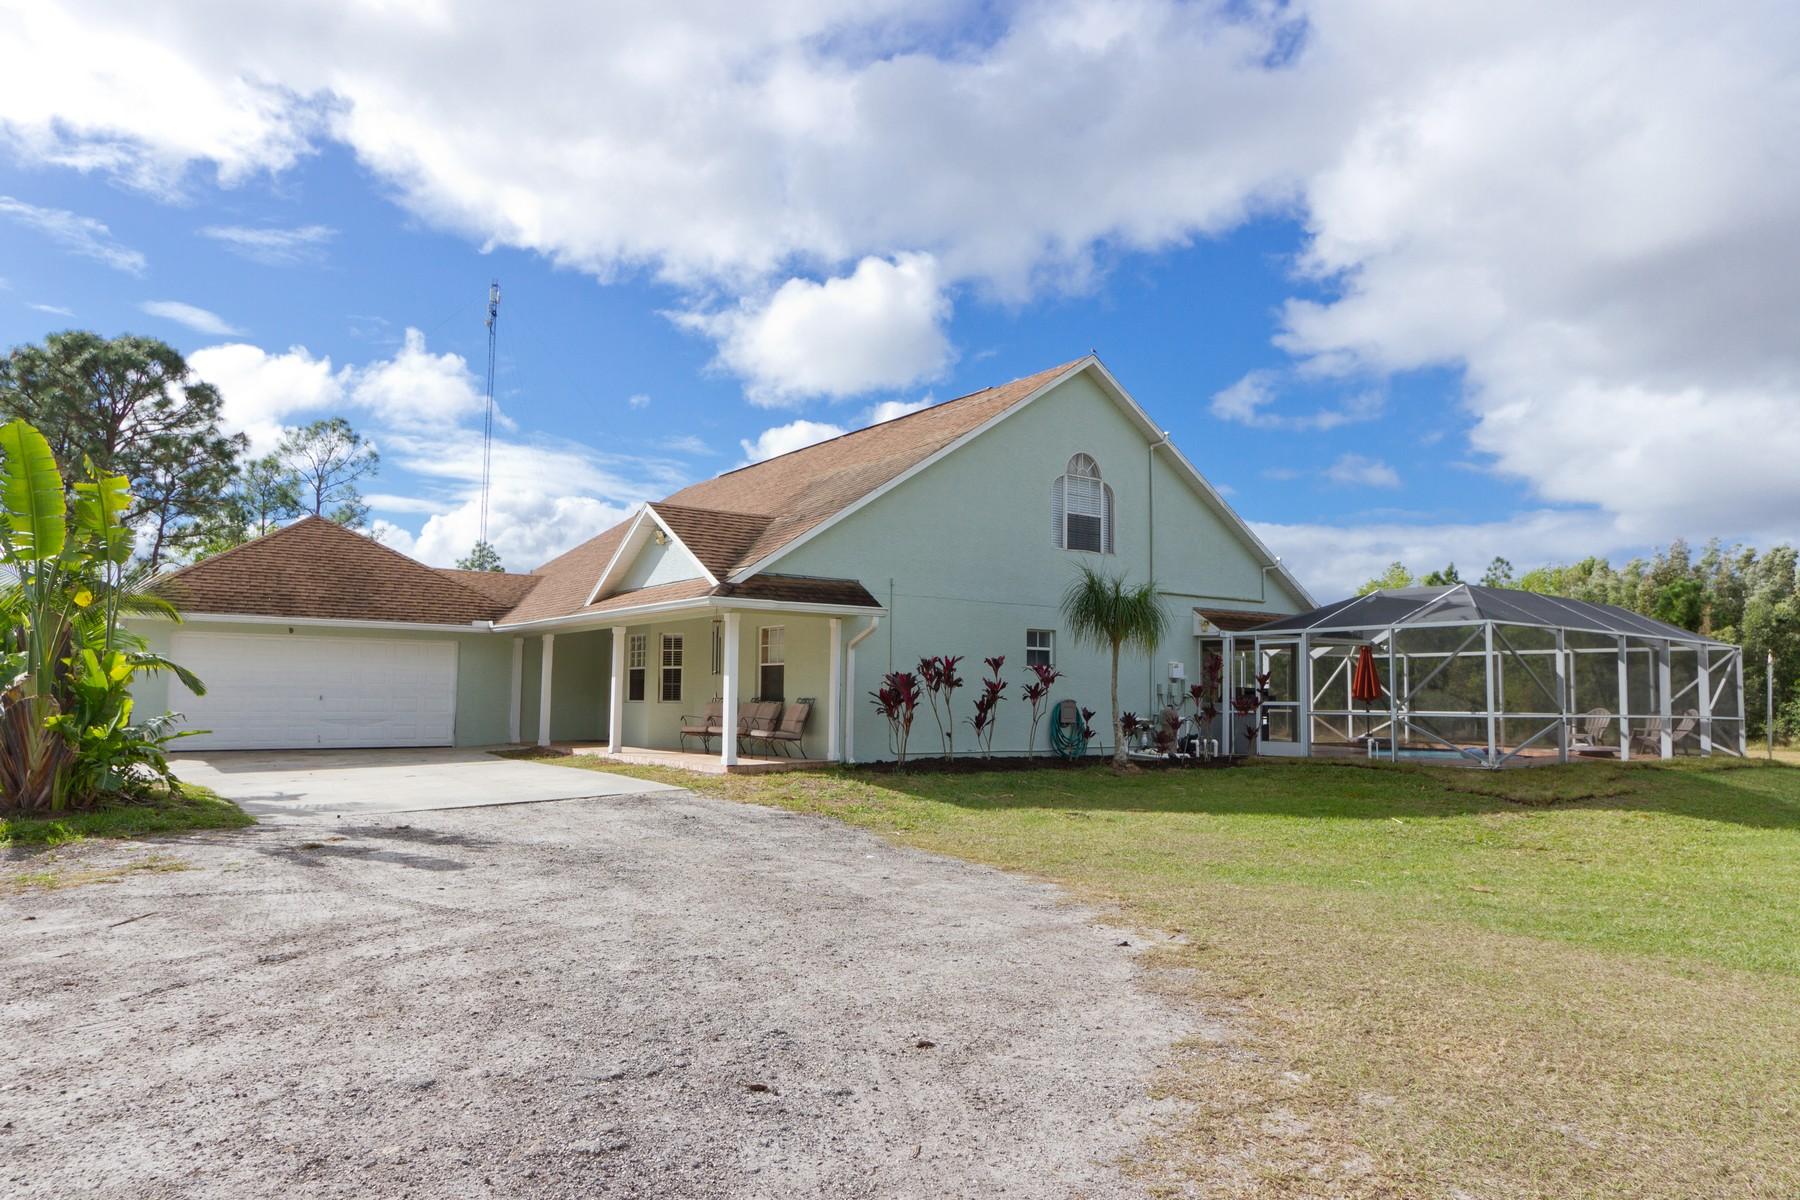 Casa Unifamiliar por un Venta en 5 Acre- Waterfront Home 12925 79th Street Fellsmere, Florida 32948 Estados Unidos